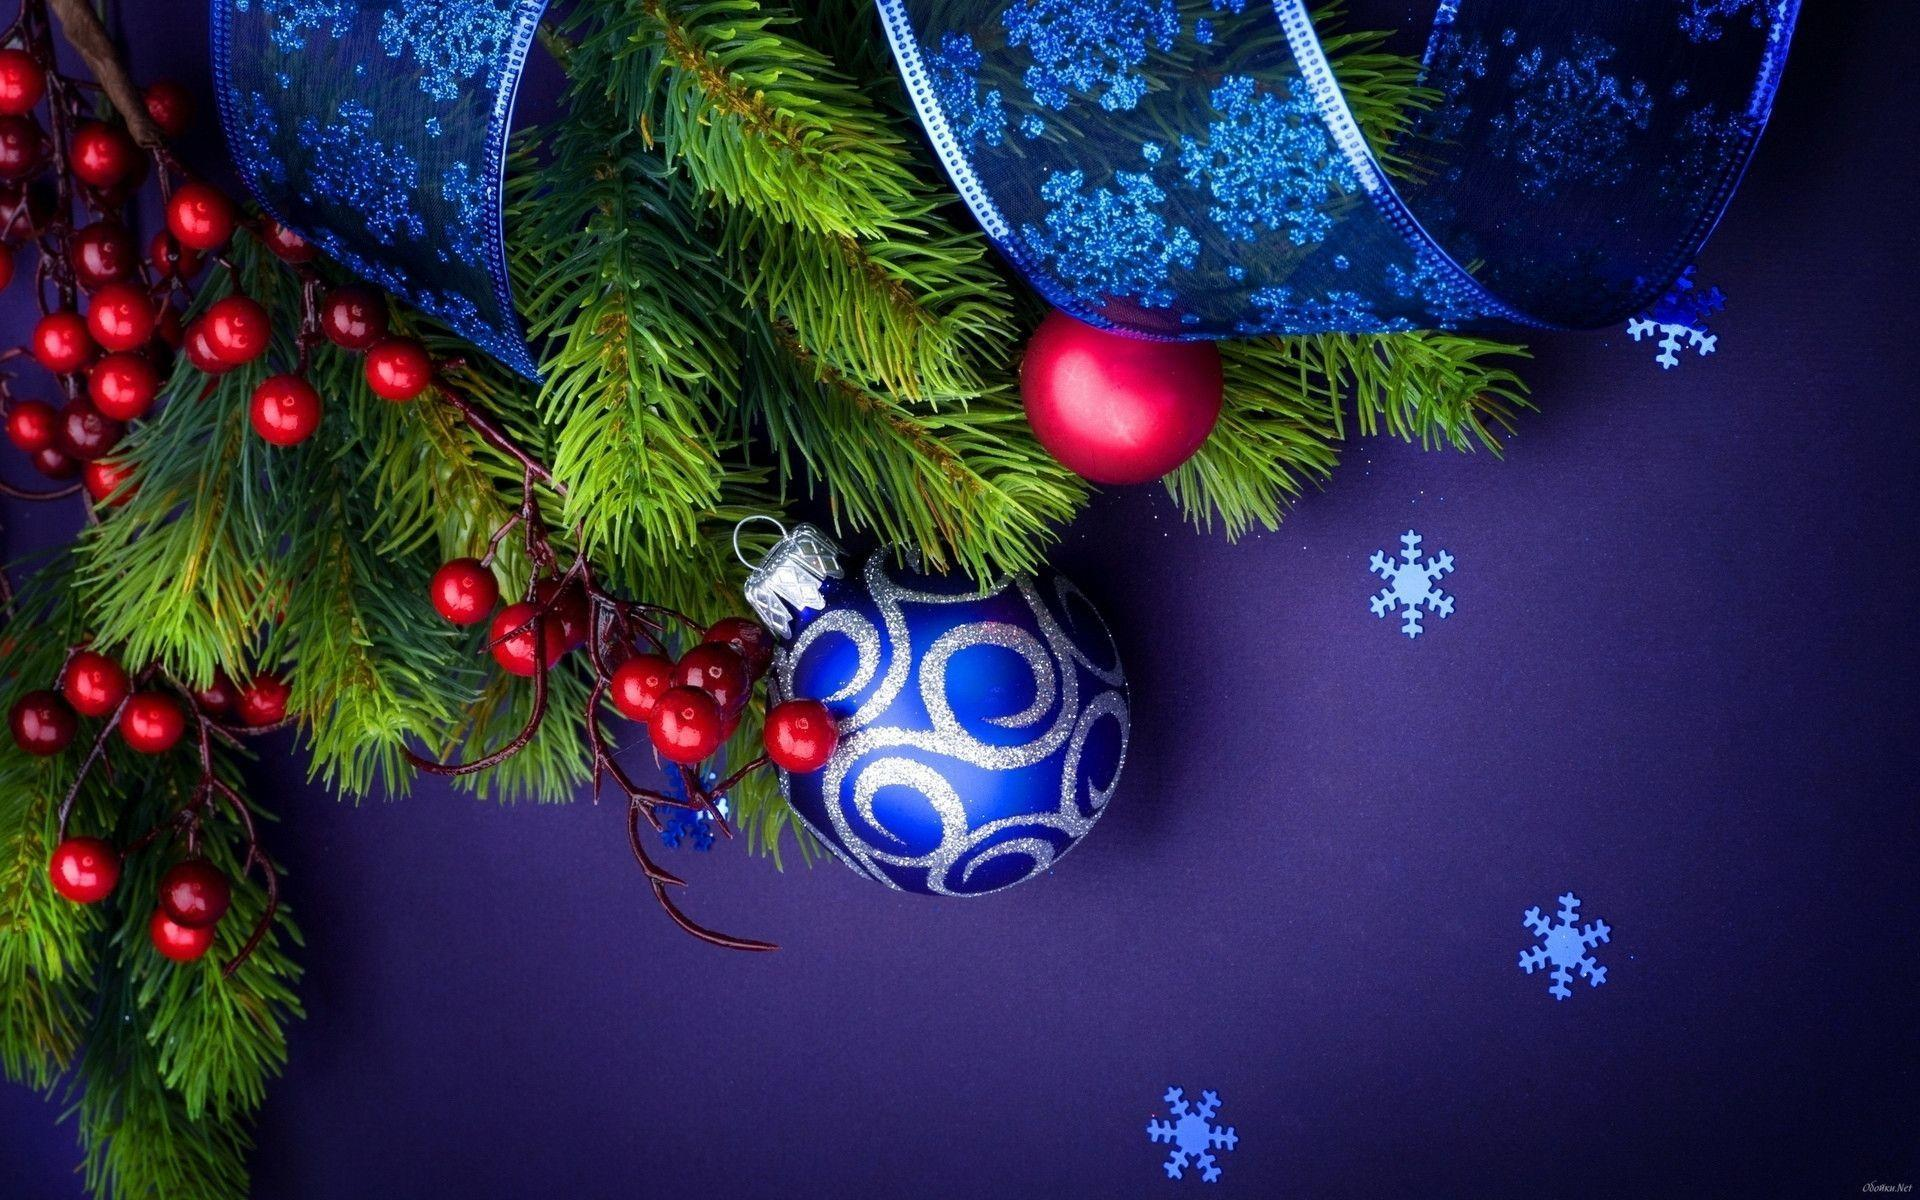 Christmas Hd Wallpaper For Desktop.Hd Christmas Desktop Backgrounds Wallpaper Cave